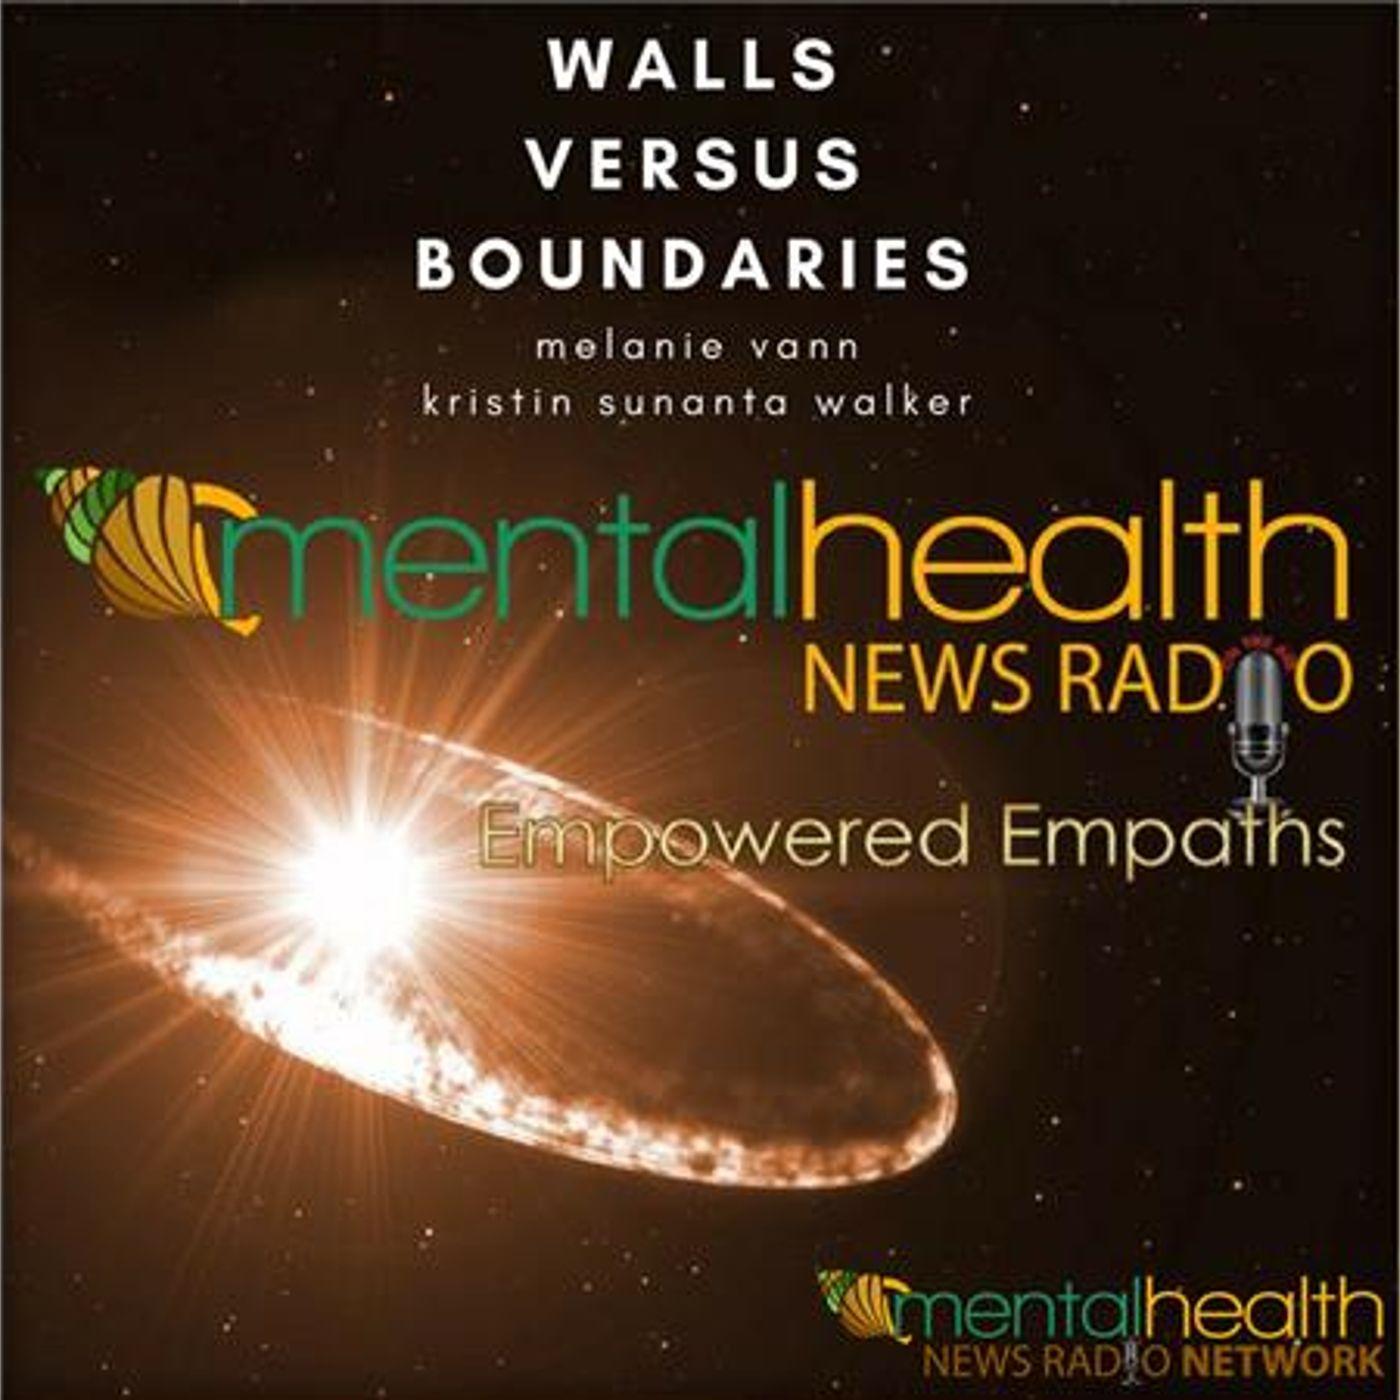 Mental Health News Radio - Empowered Empaths: Walls Versus Boundaries